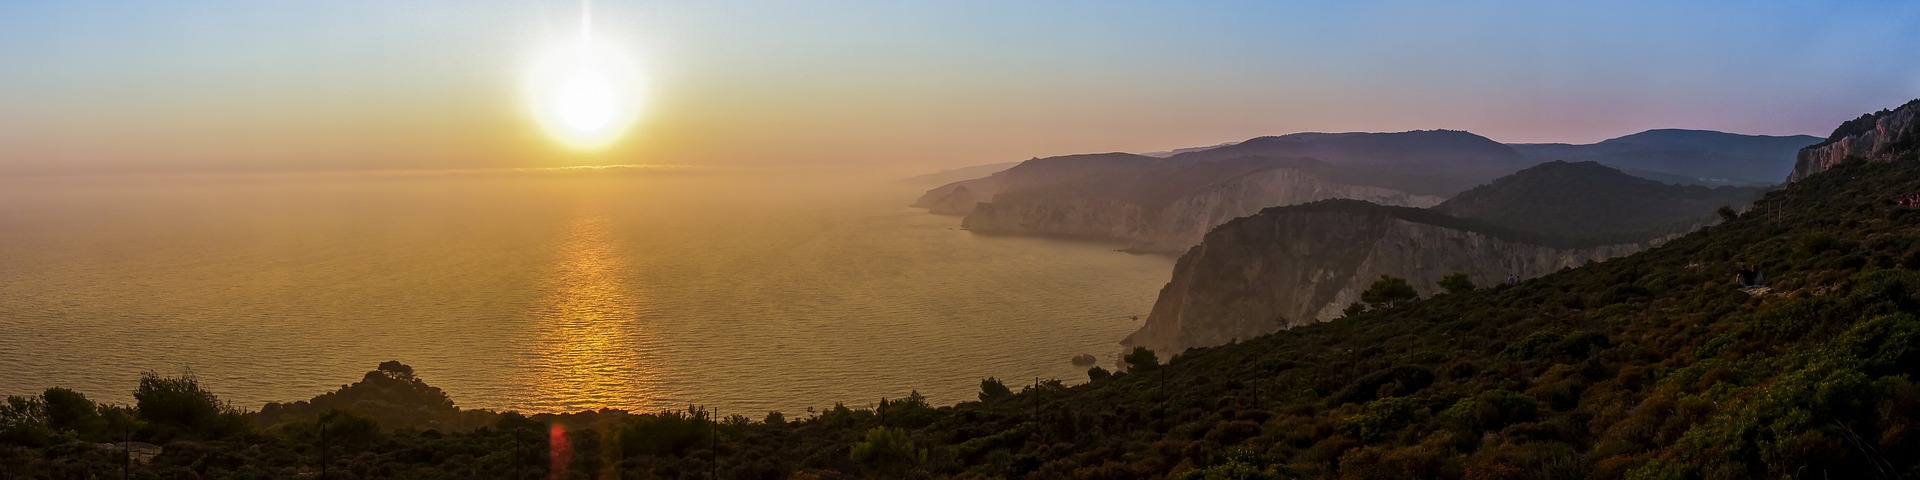 Vakantie Griekenland Zakynthos zonsondergang